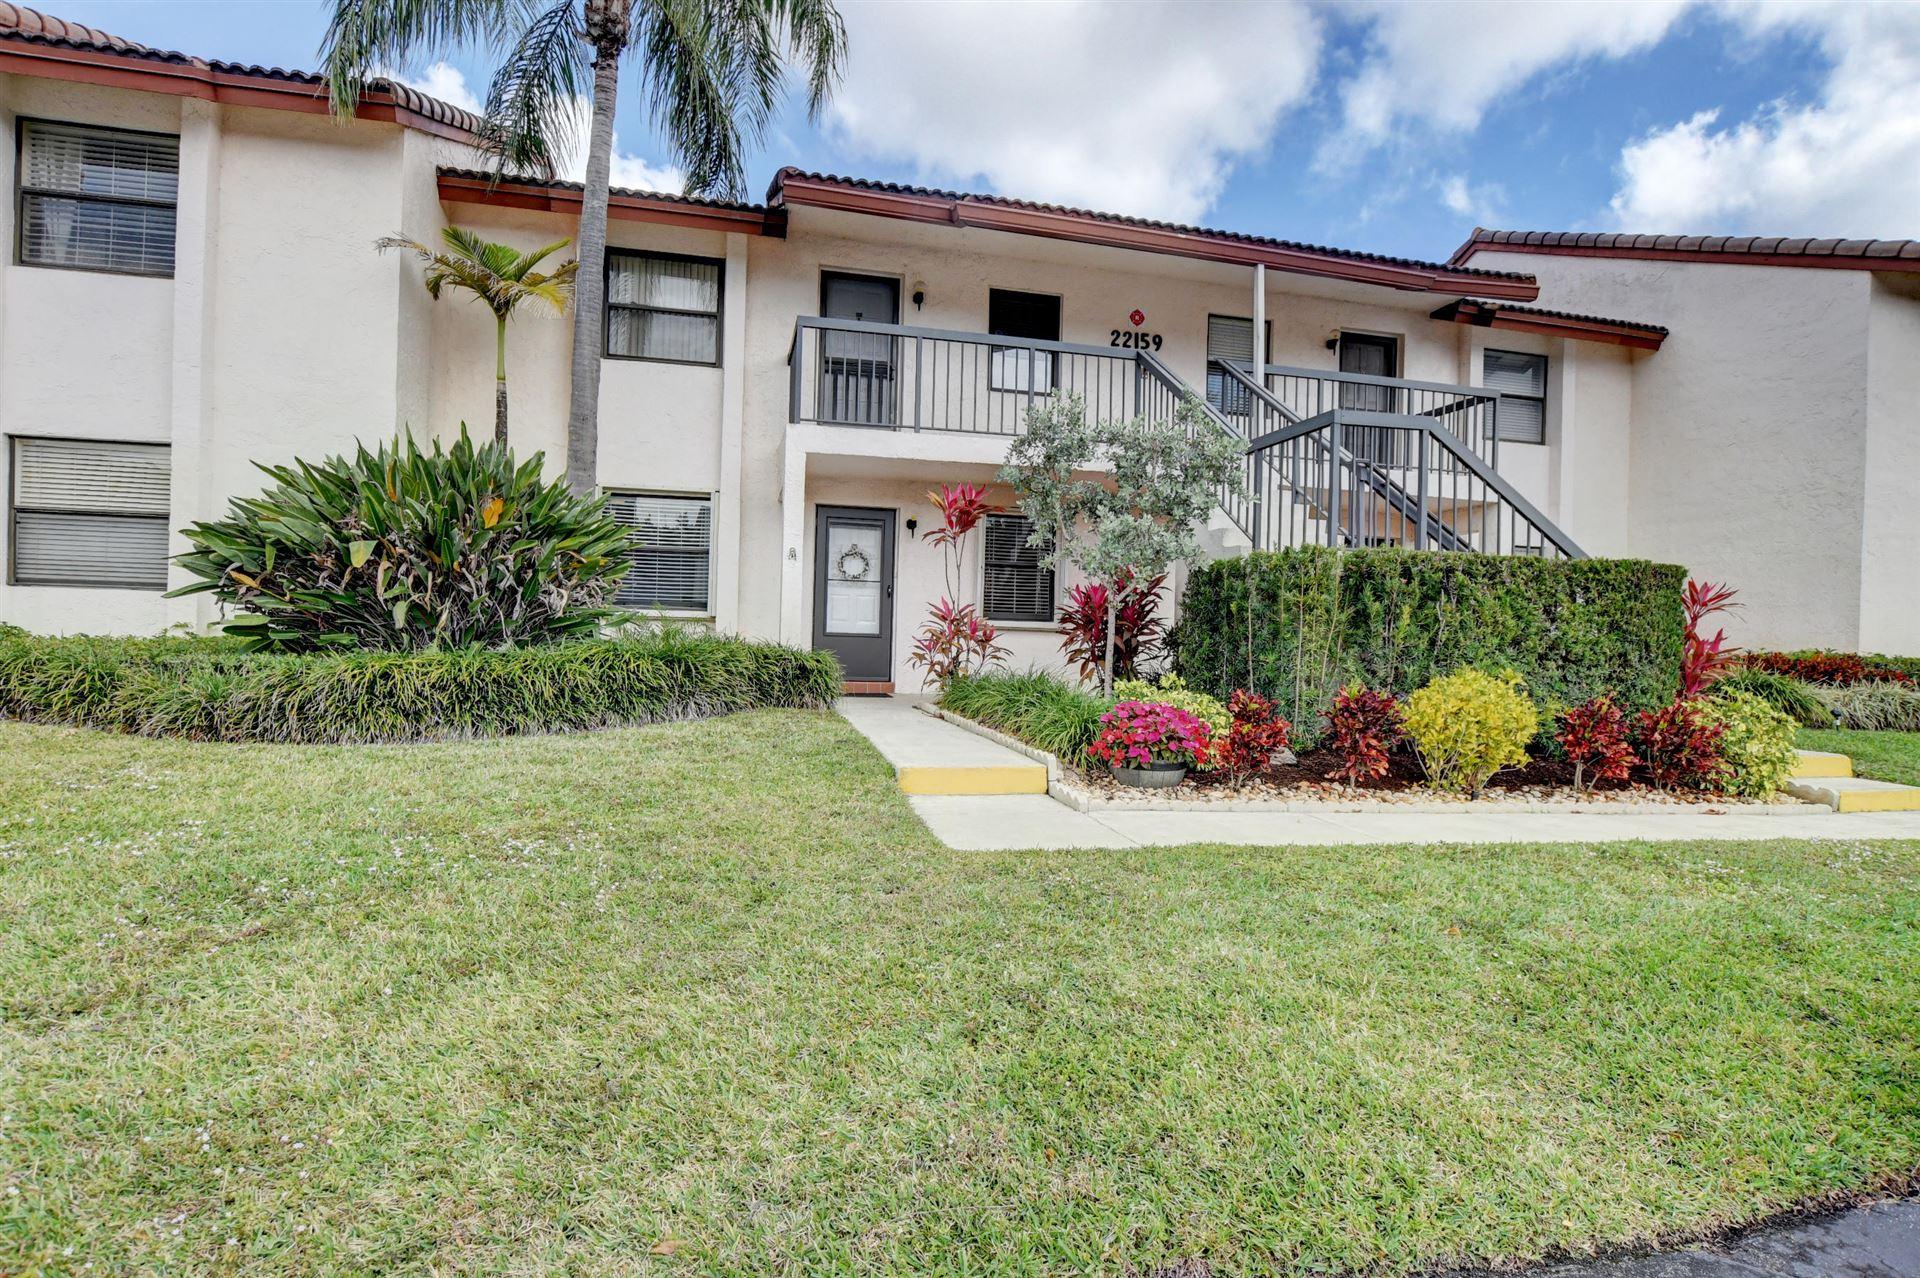 22159 Palms Way #103, Boca Raton, FL 33433 - #: RX-10691817